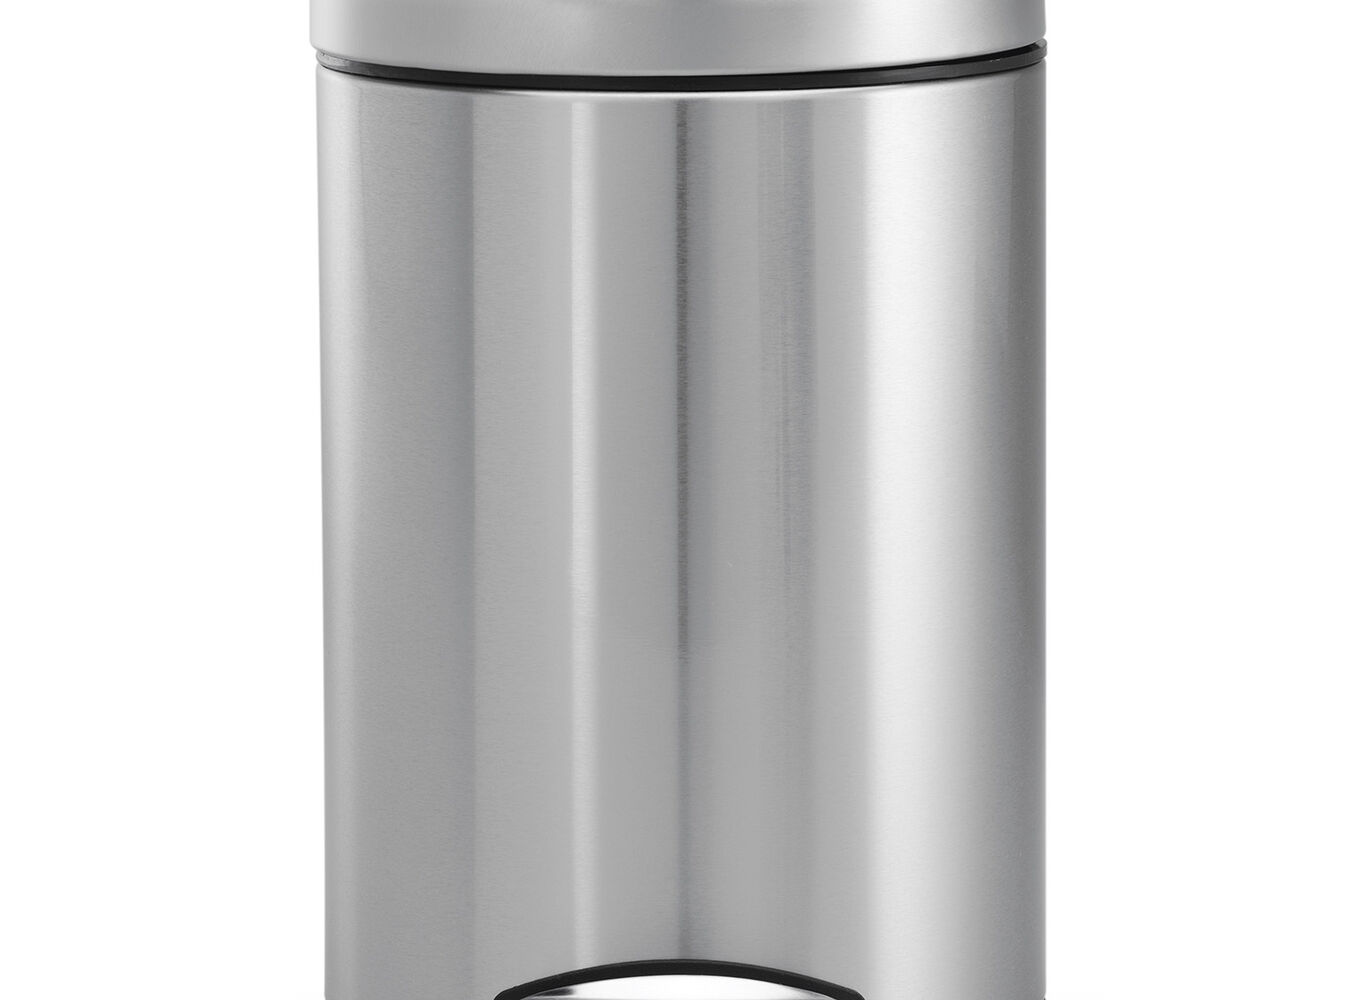 Simplehuman Round Trash Can, 1.19 gal.   Sur La Table